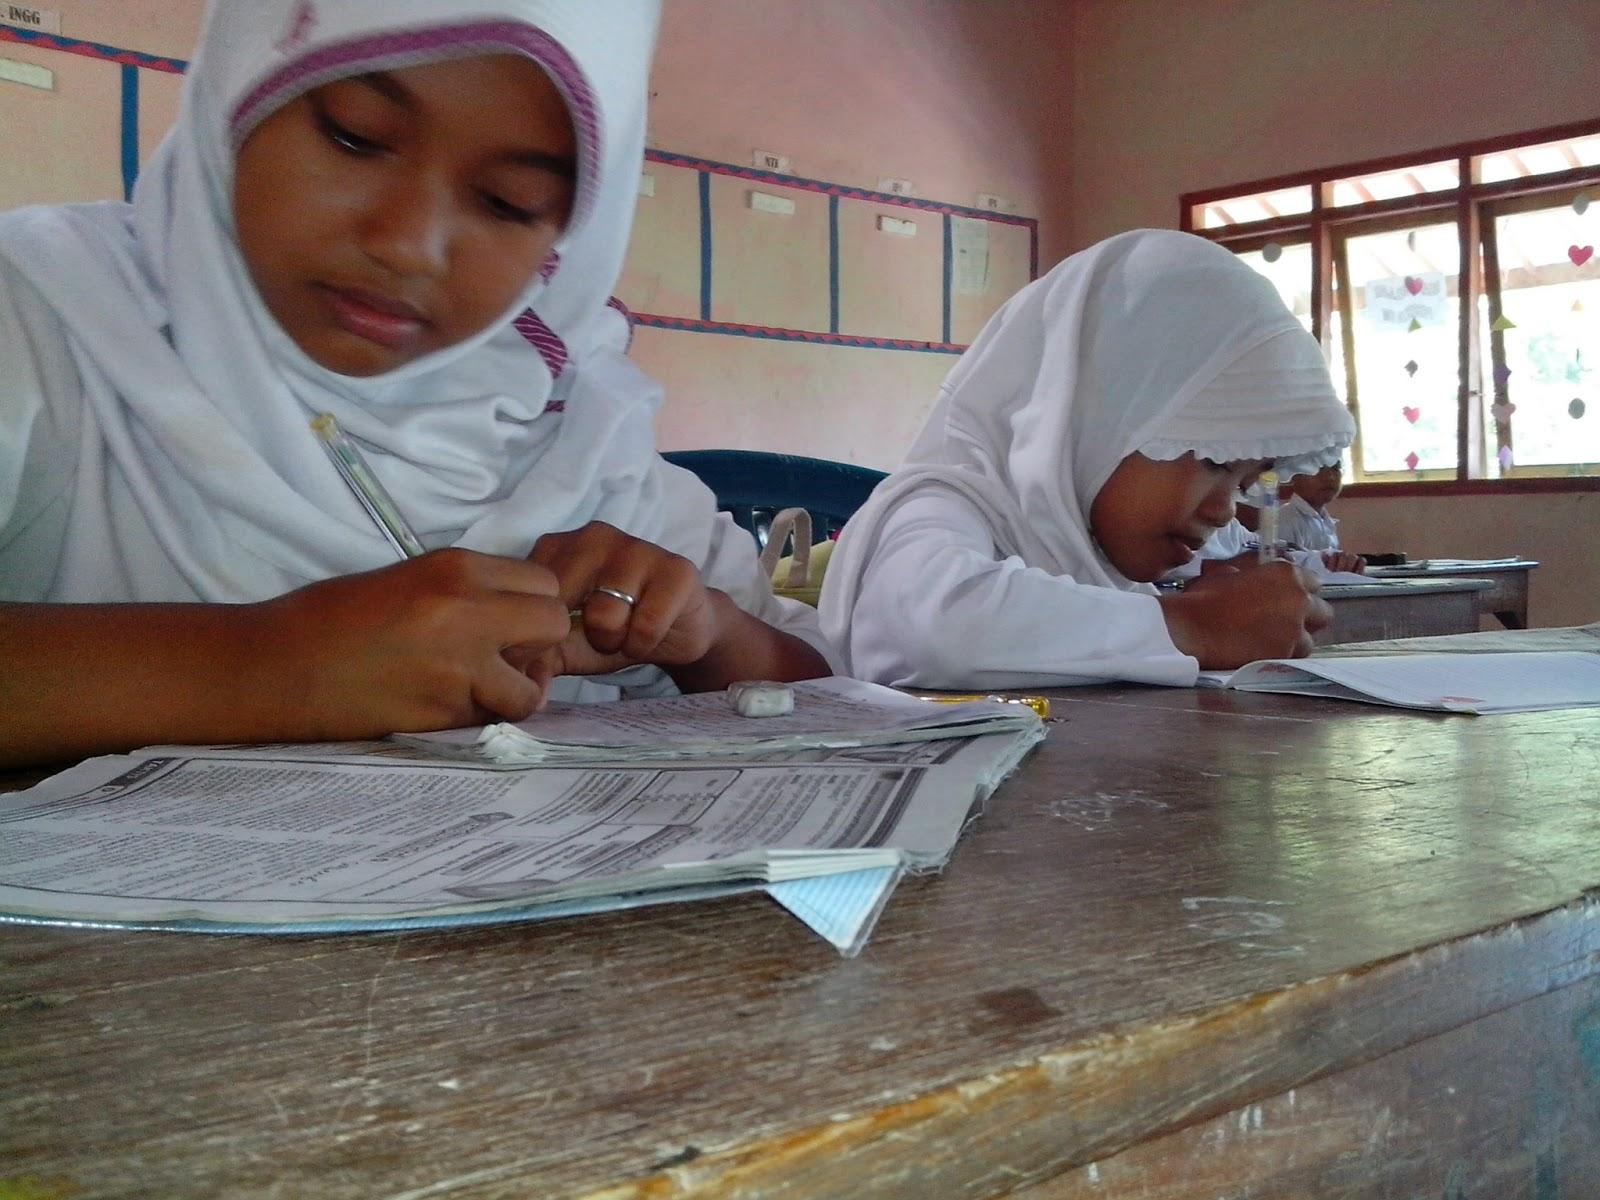 Soal Ukk Bahasa Indonesia Kelas 5 Sd Mi Mi Kalimulyo